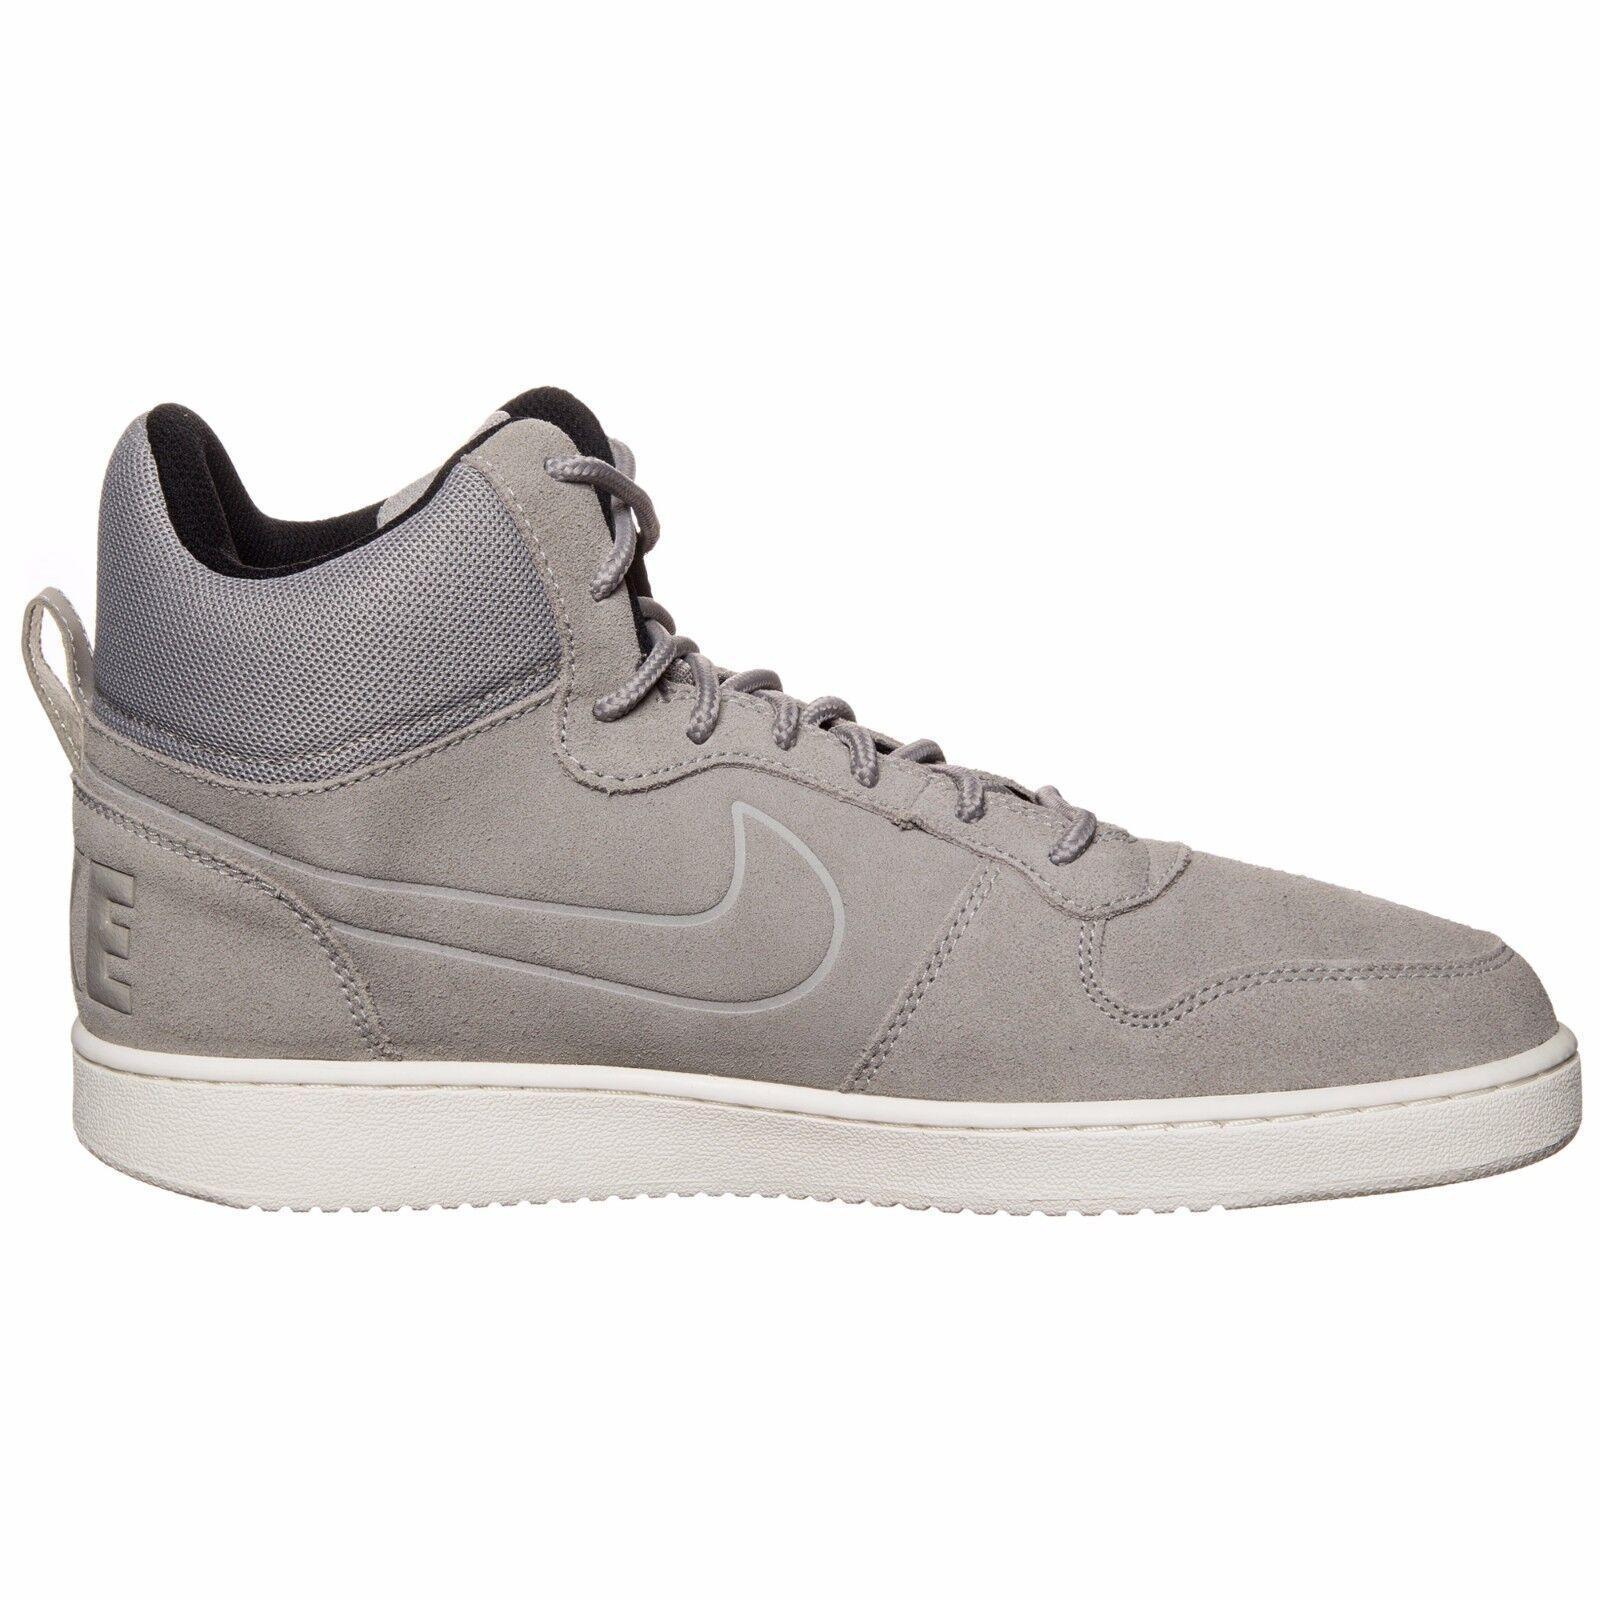 Nike - Court Borough Mid Prem - Scarpe Uomo - Cobblestone Sail - 844884 006 | Sensazione Di Comfort  | Sig/Sig Ra Scarpa